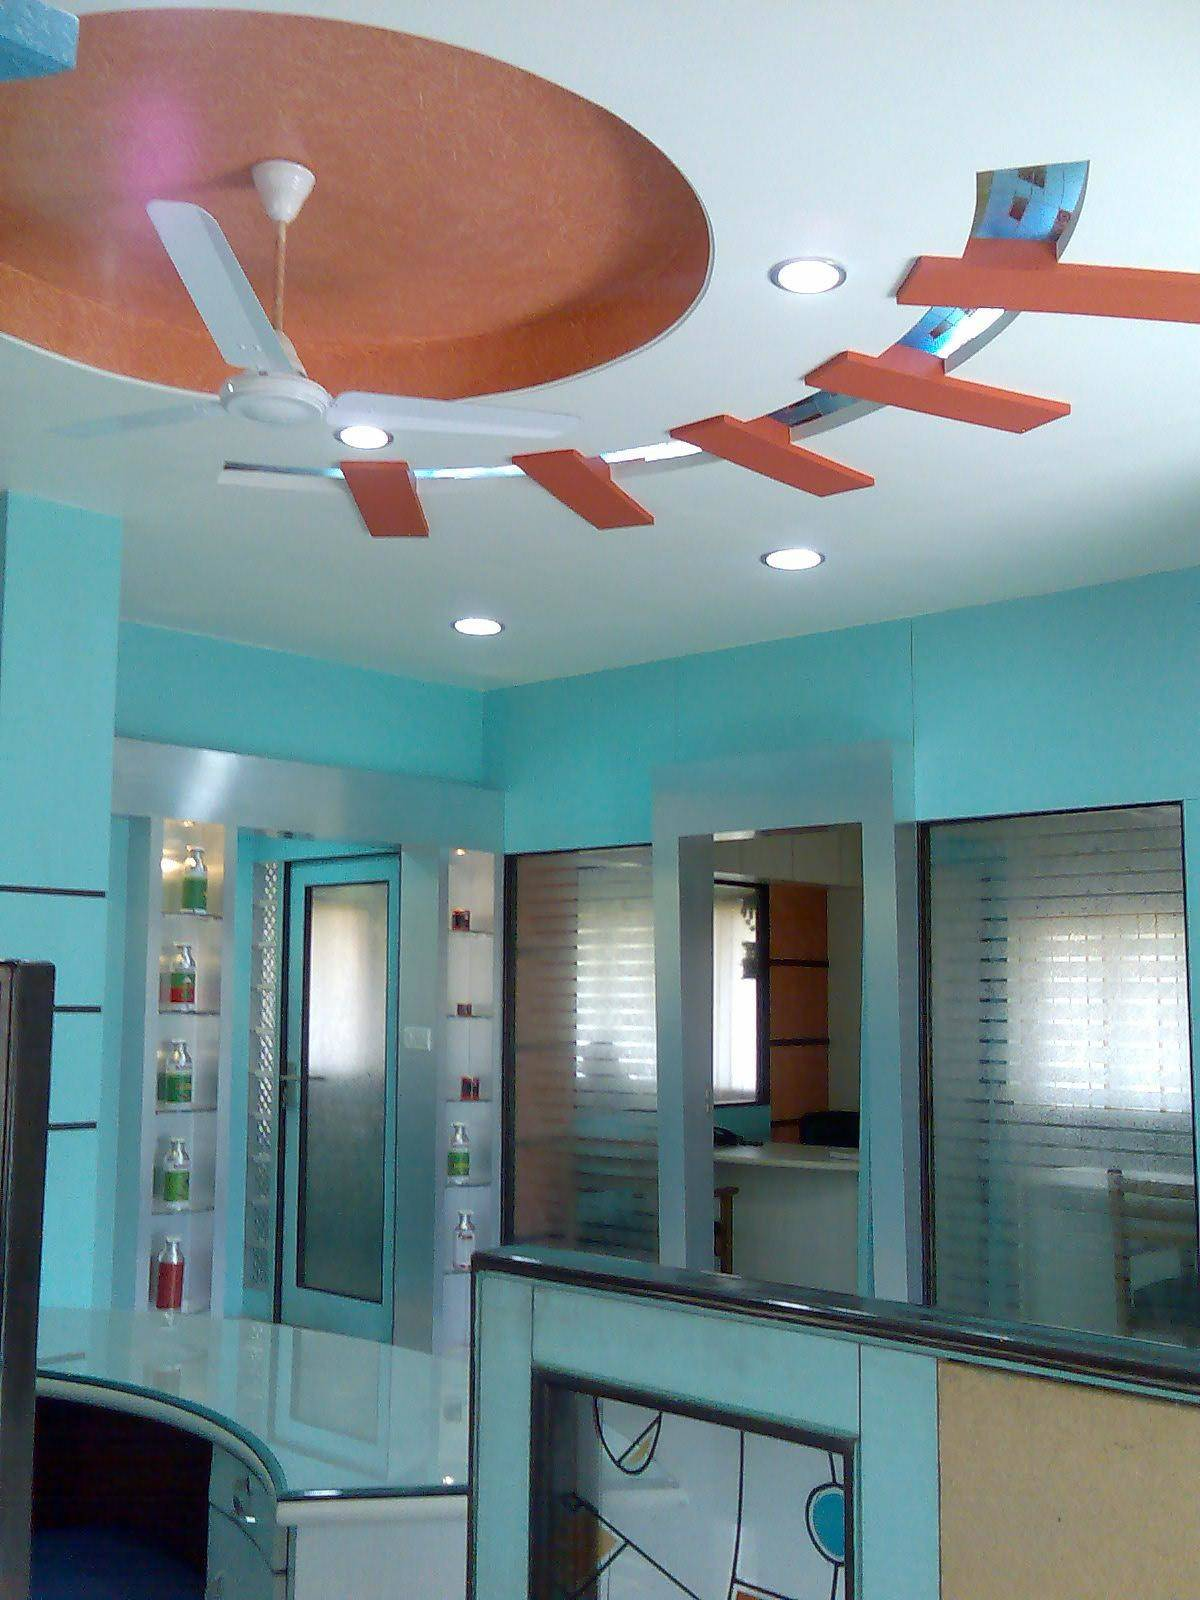 Bedroom Ceiling Design Modern Diy Art Designs